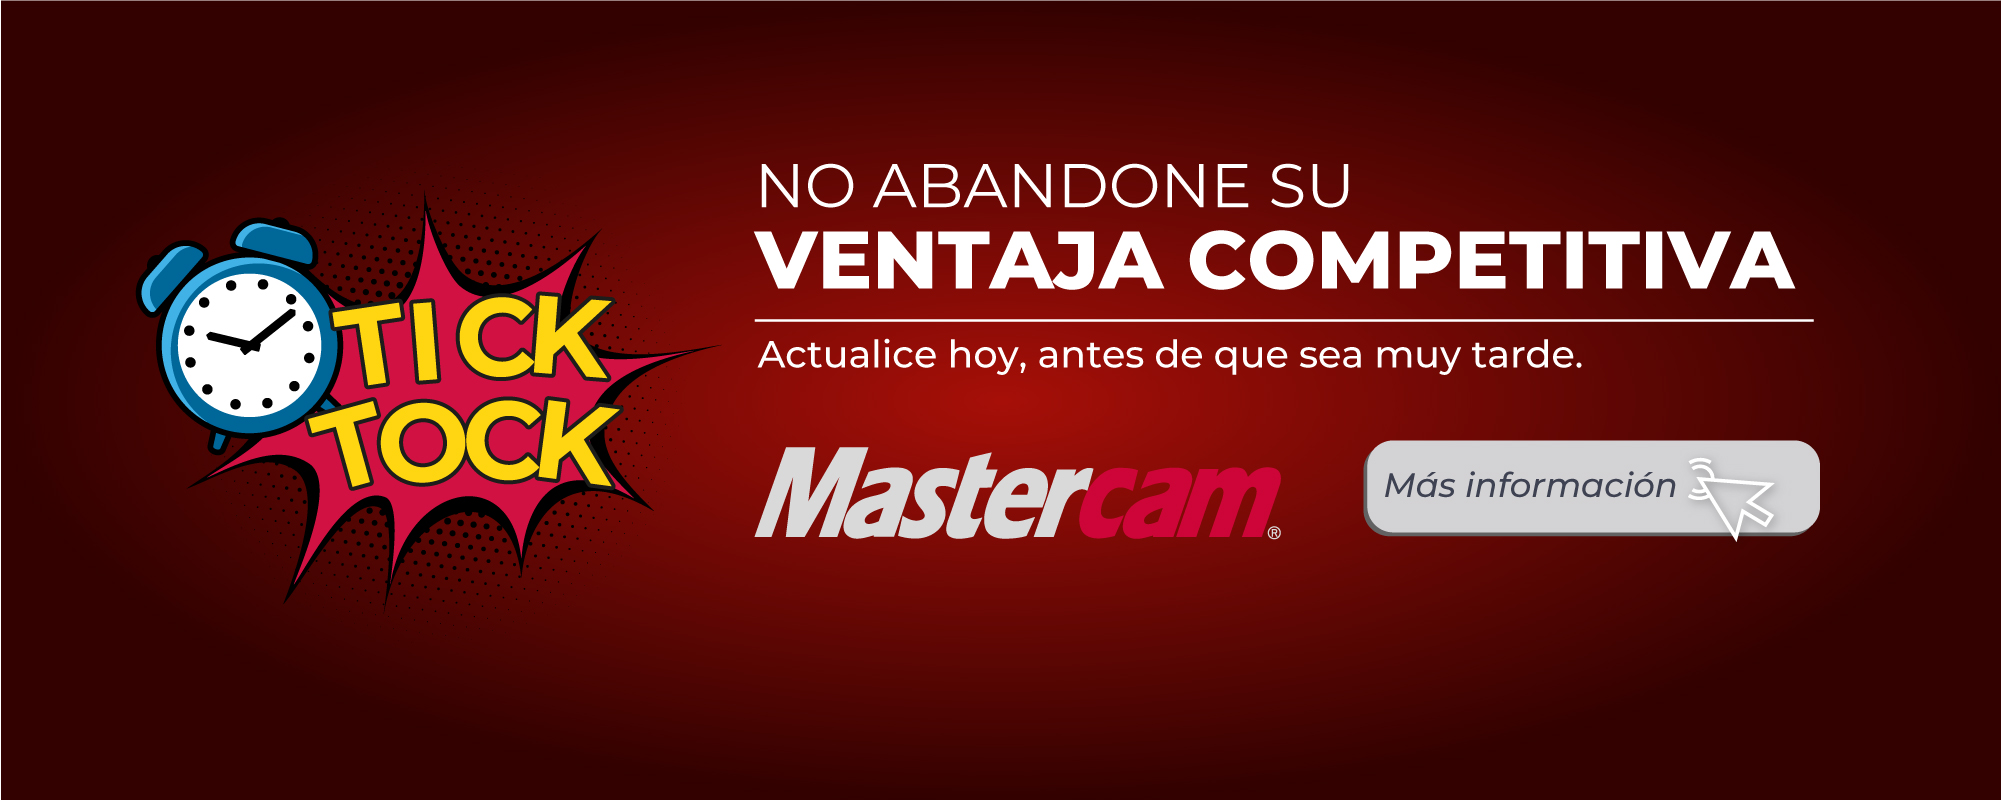 actualizacion-mastercam-imocom